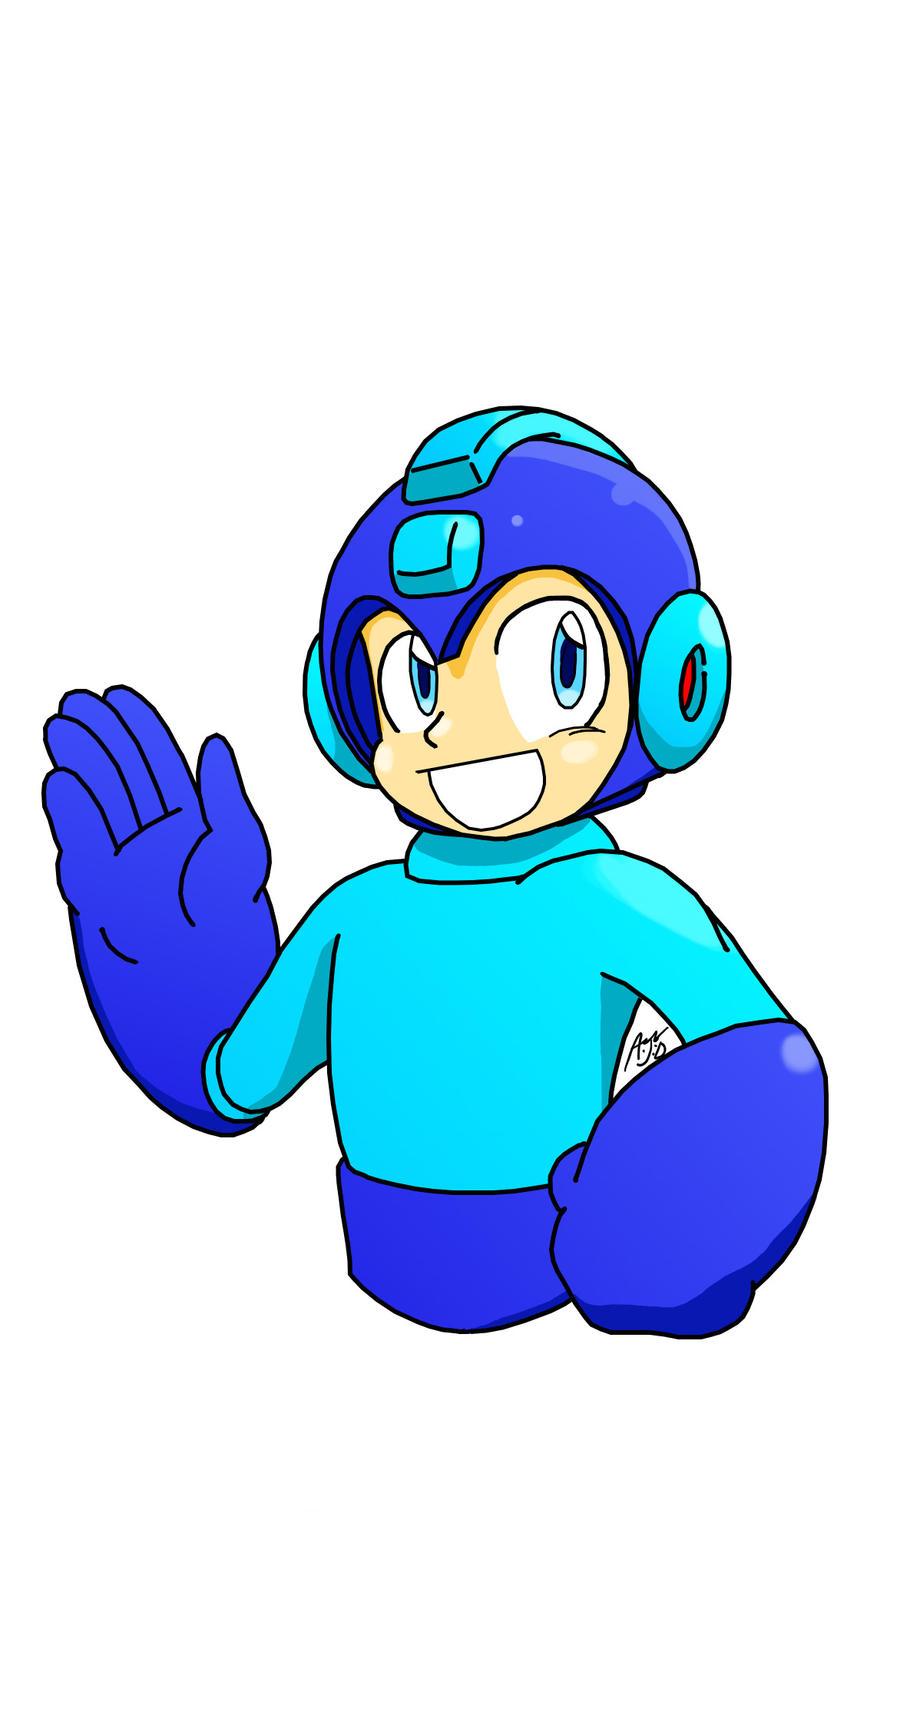 Megaman: Classic by Retro-Eternity